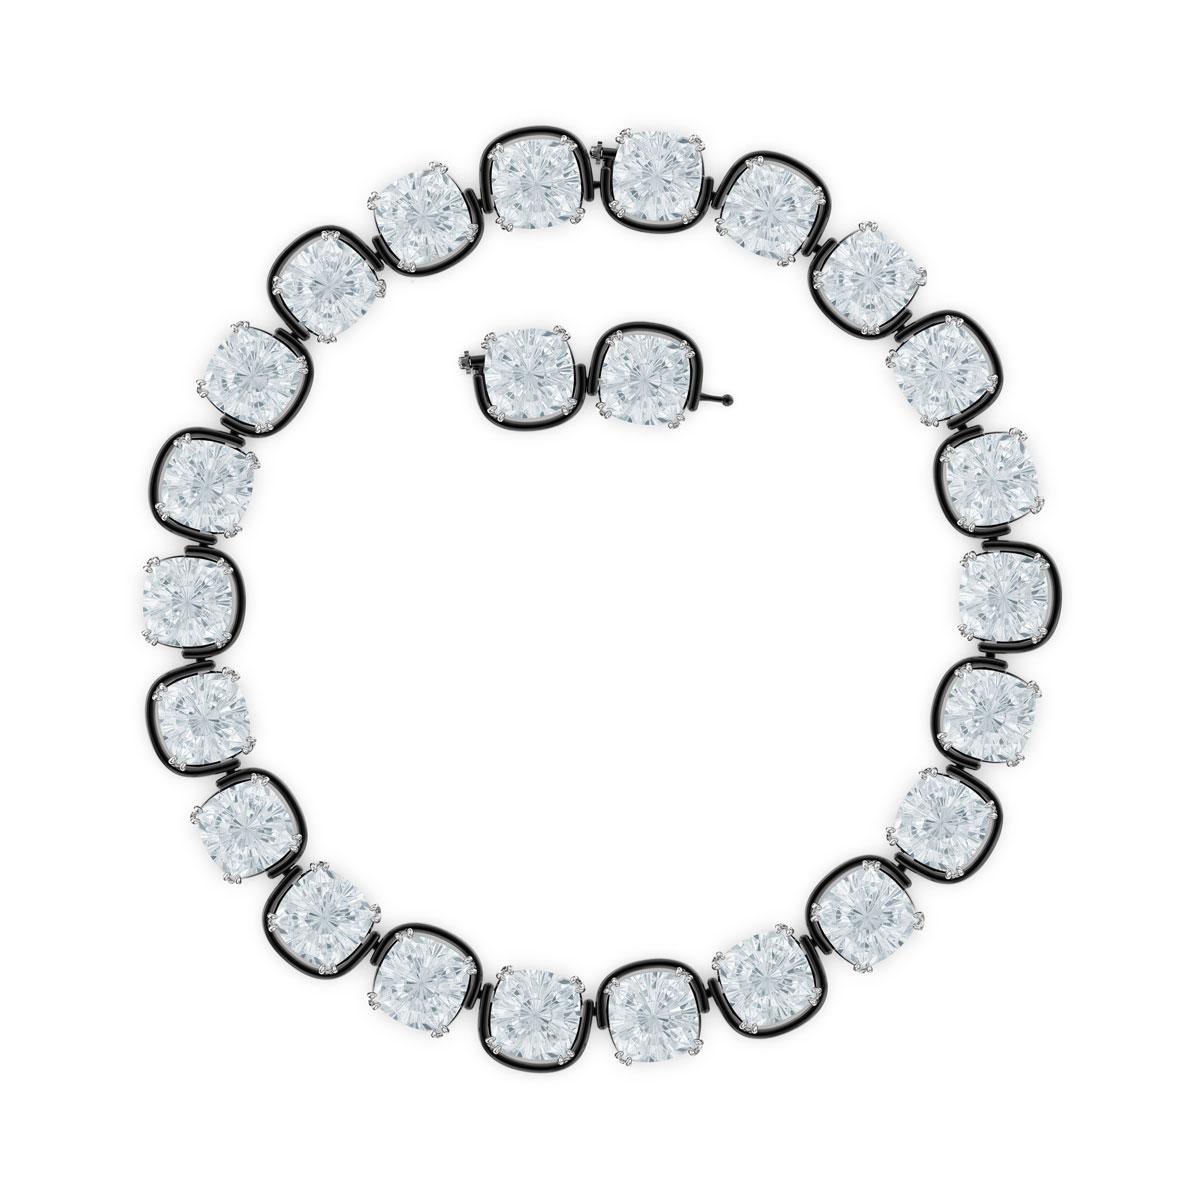 Swarovski Harmonia Choker Necklace , Cushion Cut Crystals, White, Mixed Metal Finish